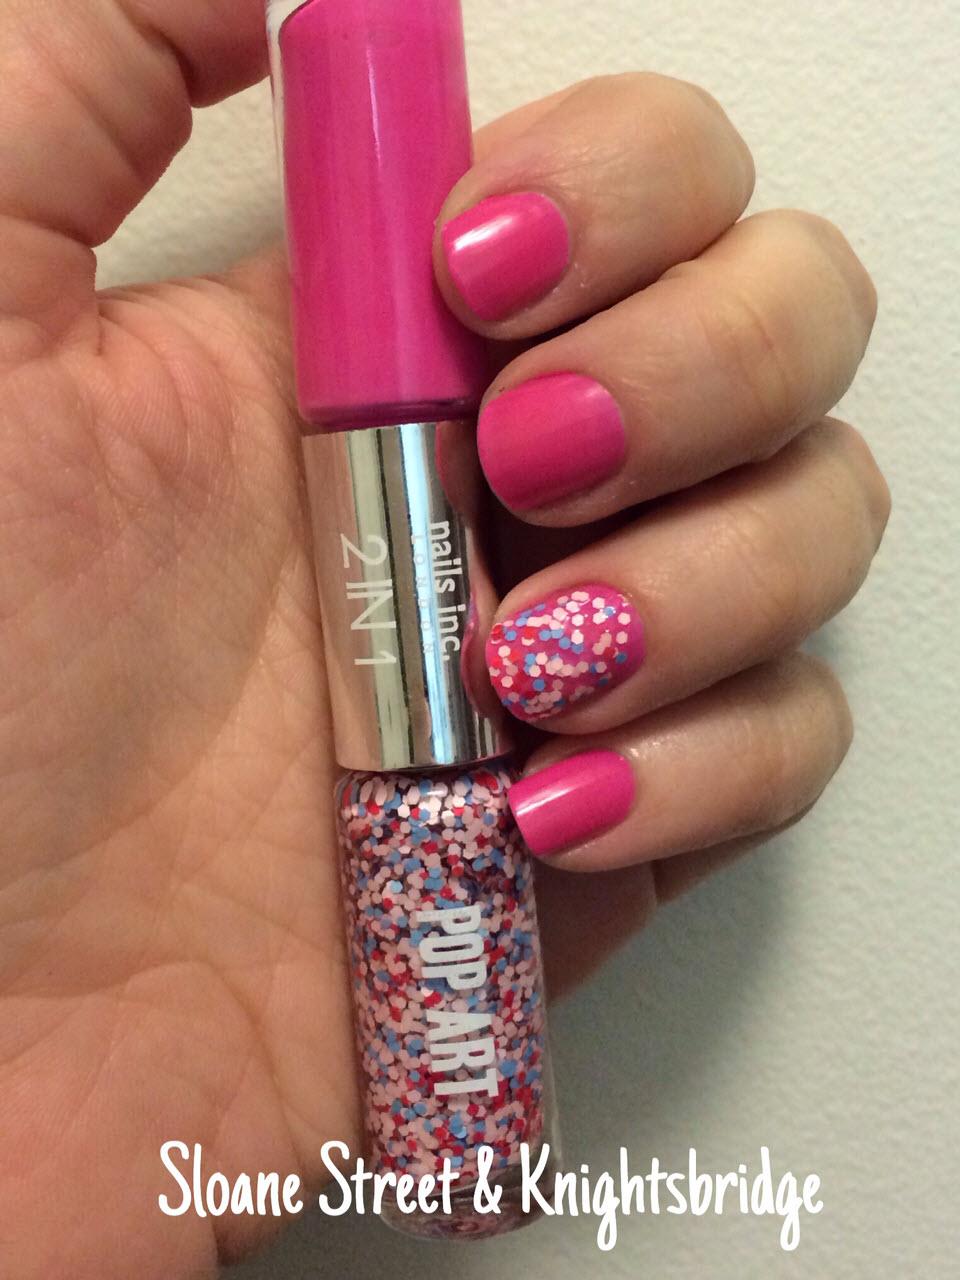 52 Shades of Nail Polish: A Mani for Every Monday of the Year: Nails ...